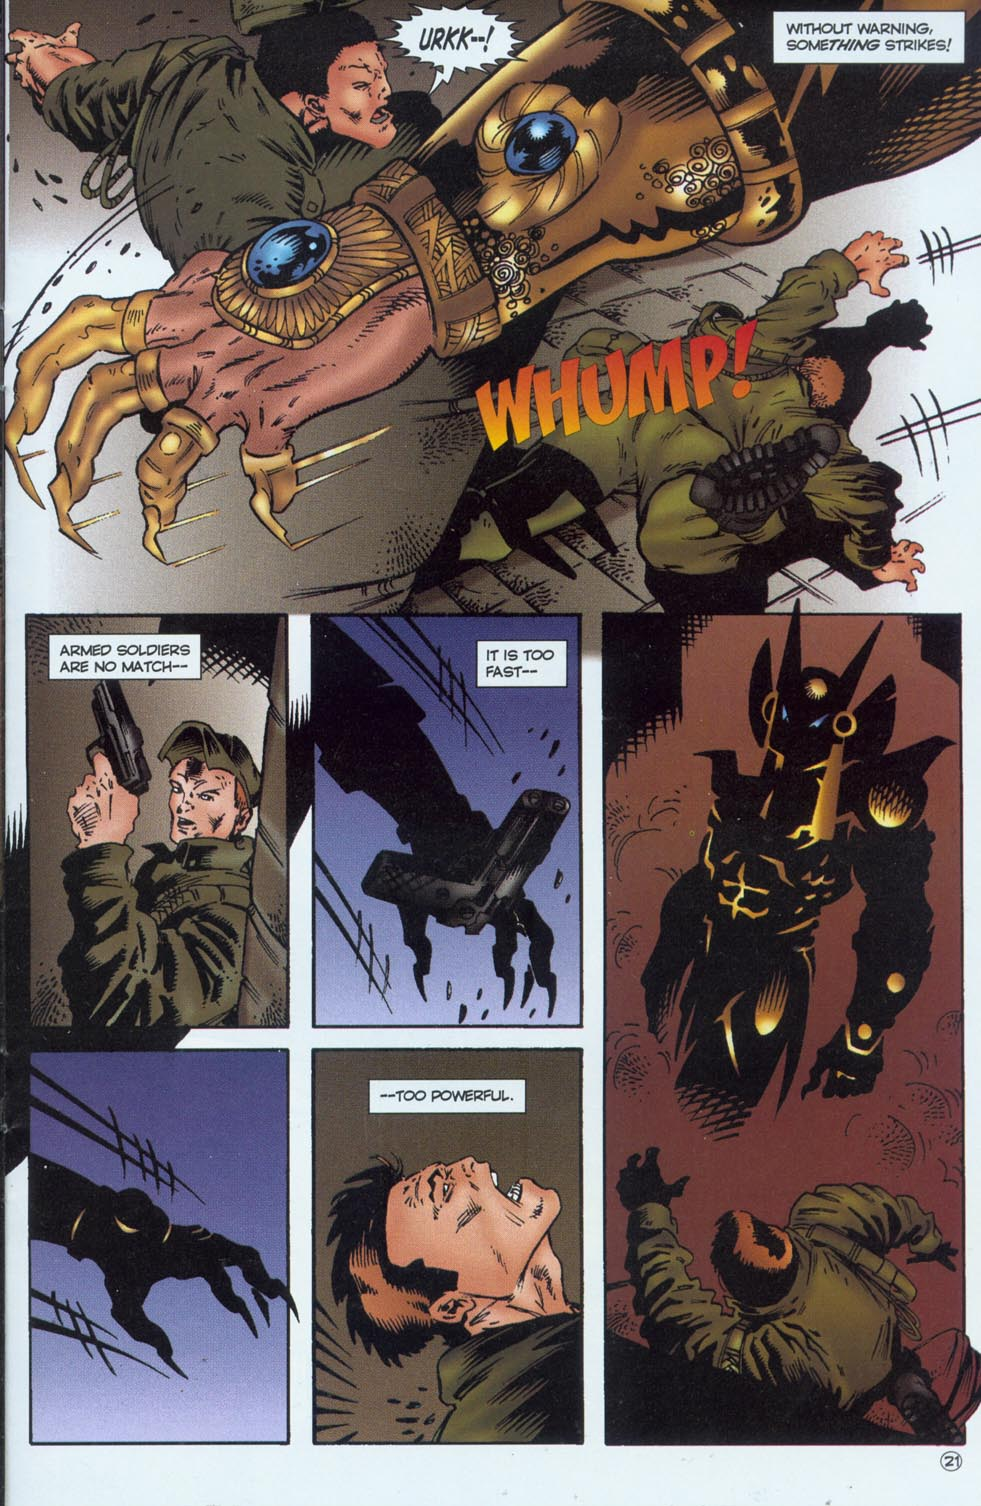 Read online Stargate comic -  Issue #1 - 23